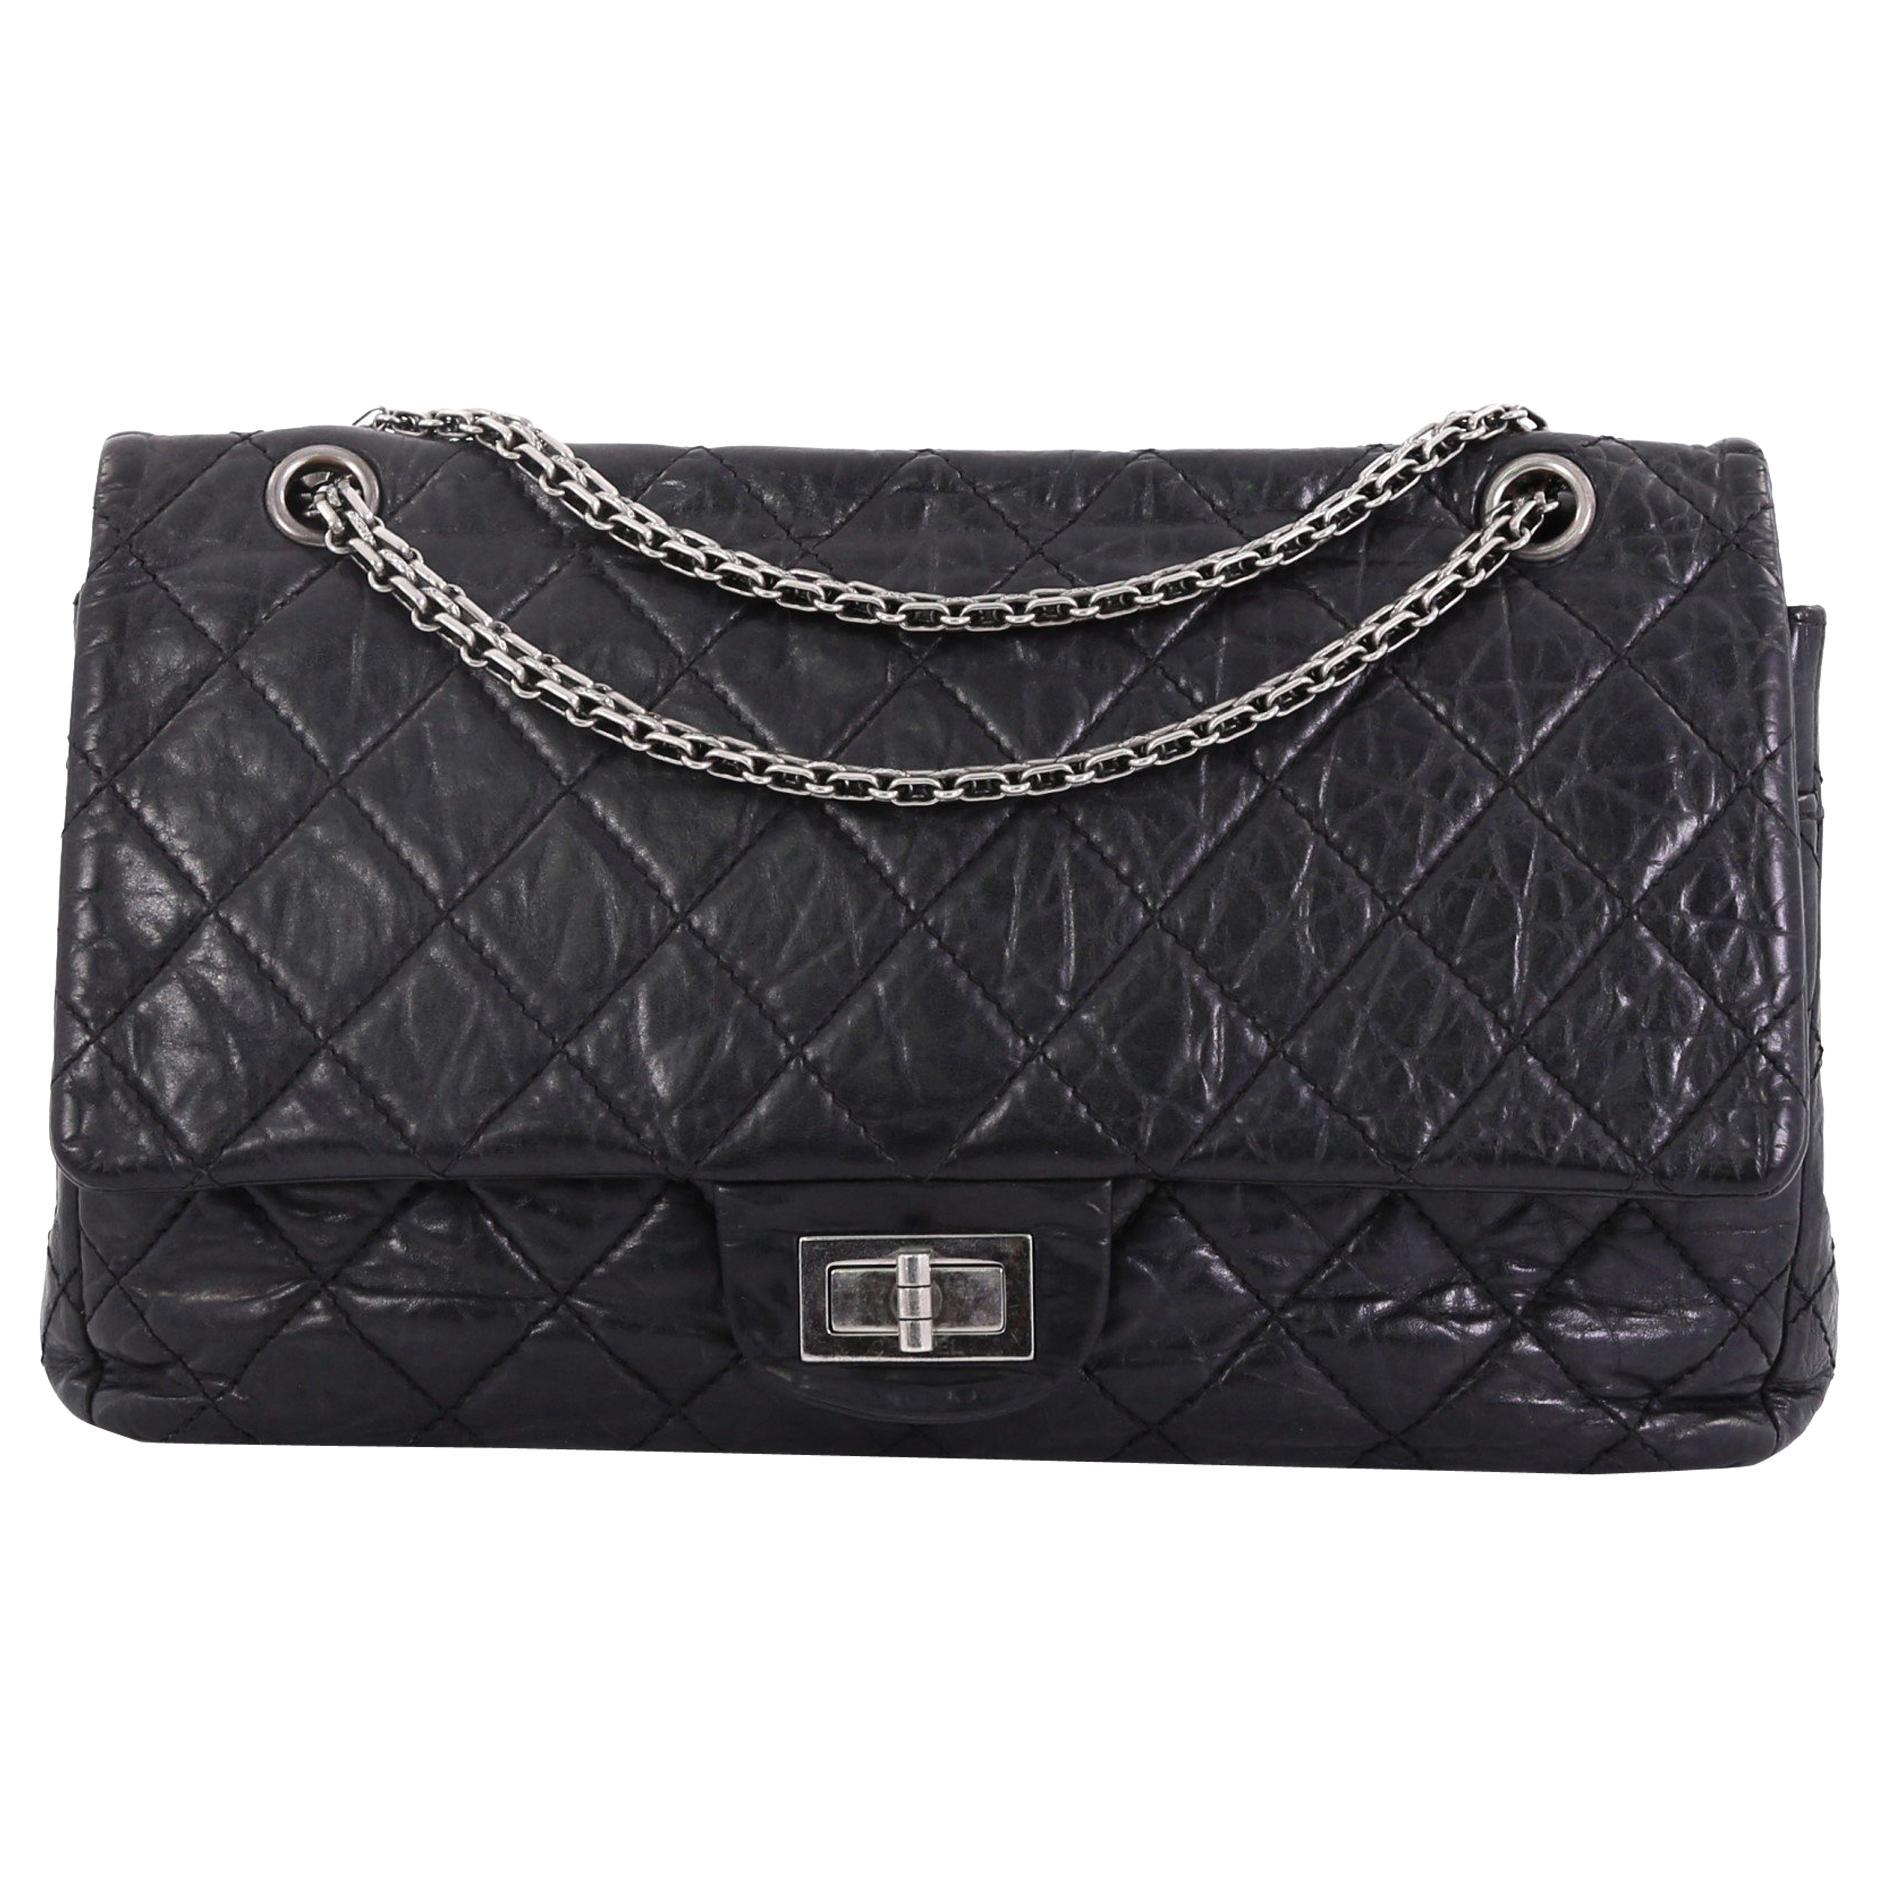 511e602479a8b1 Chanel Boy Flap Bag Cube Embossed Lambskin New Medium at 1stdibs